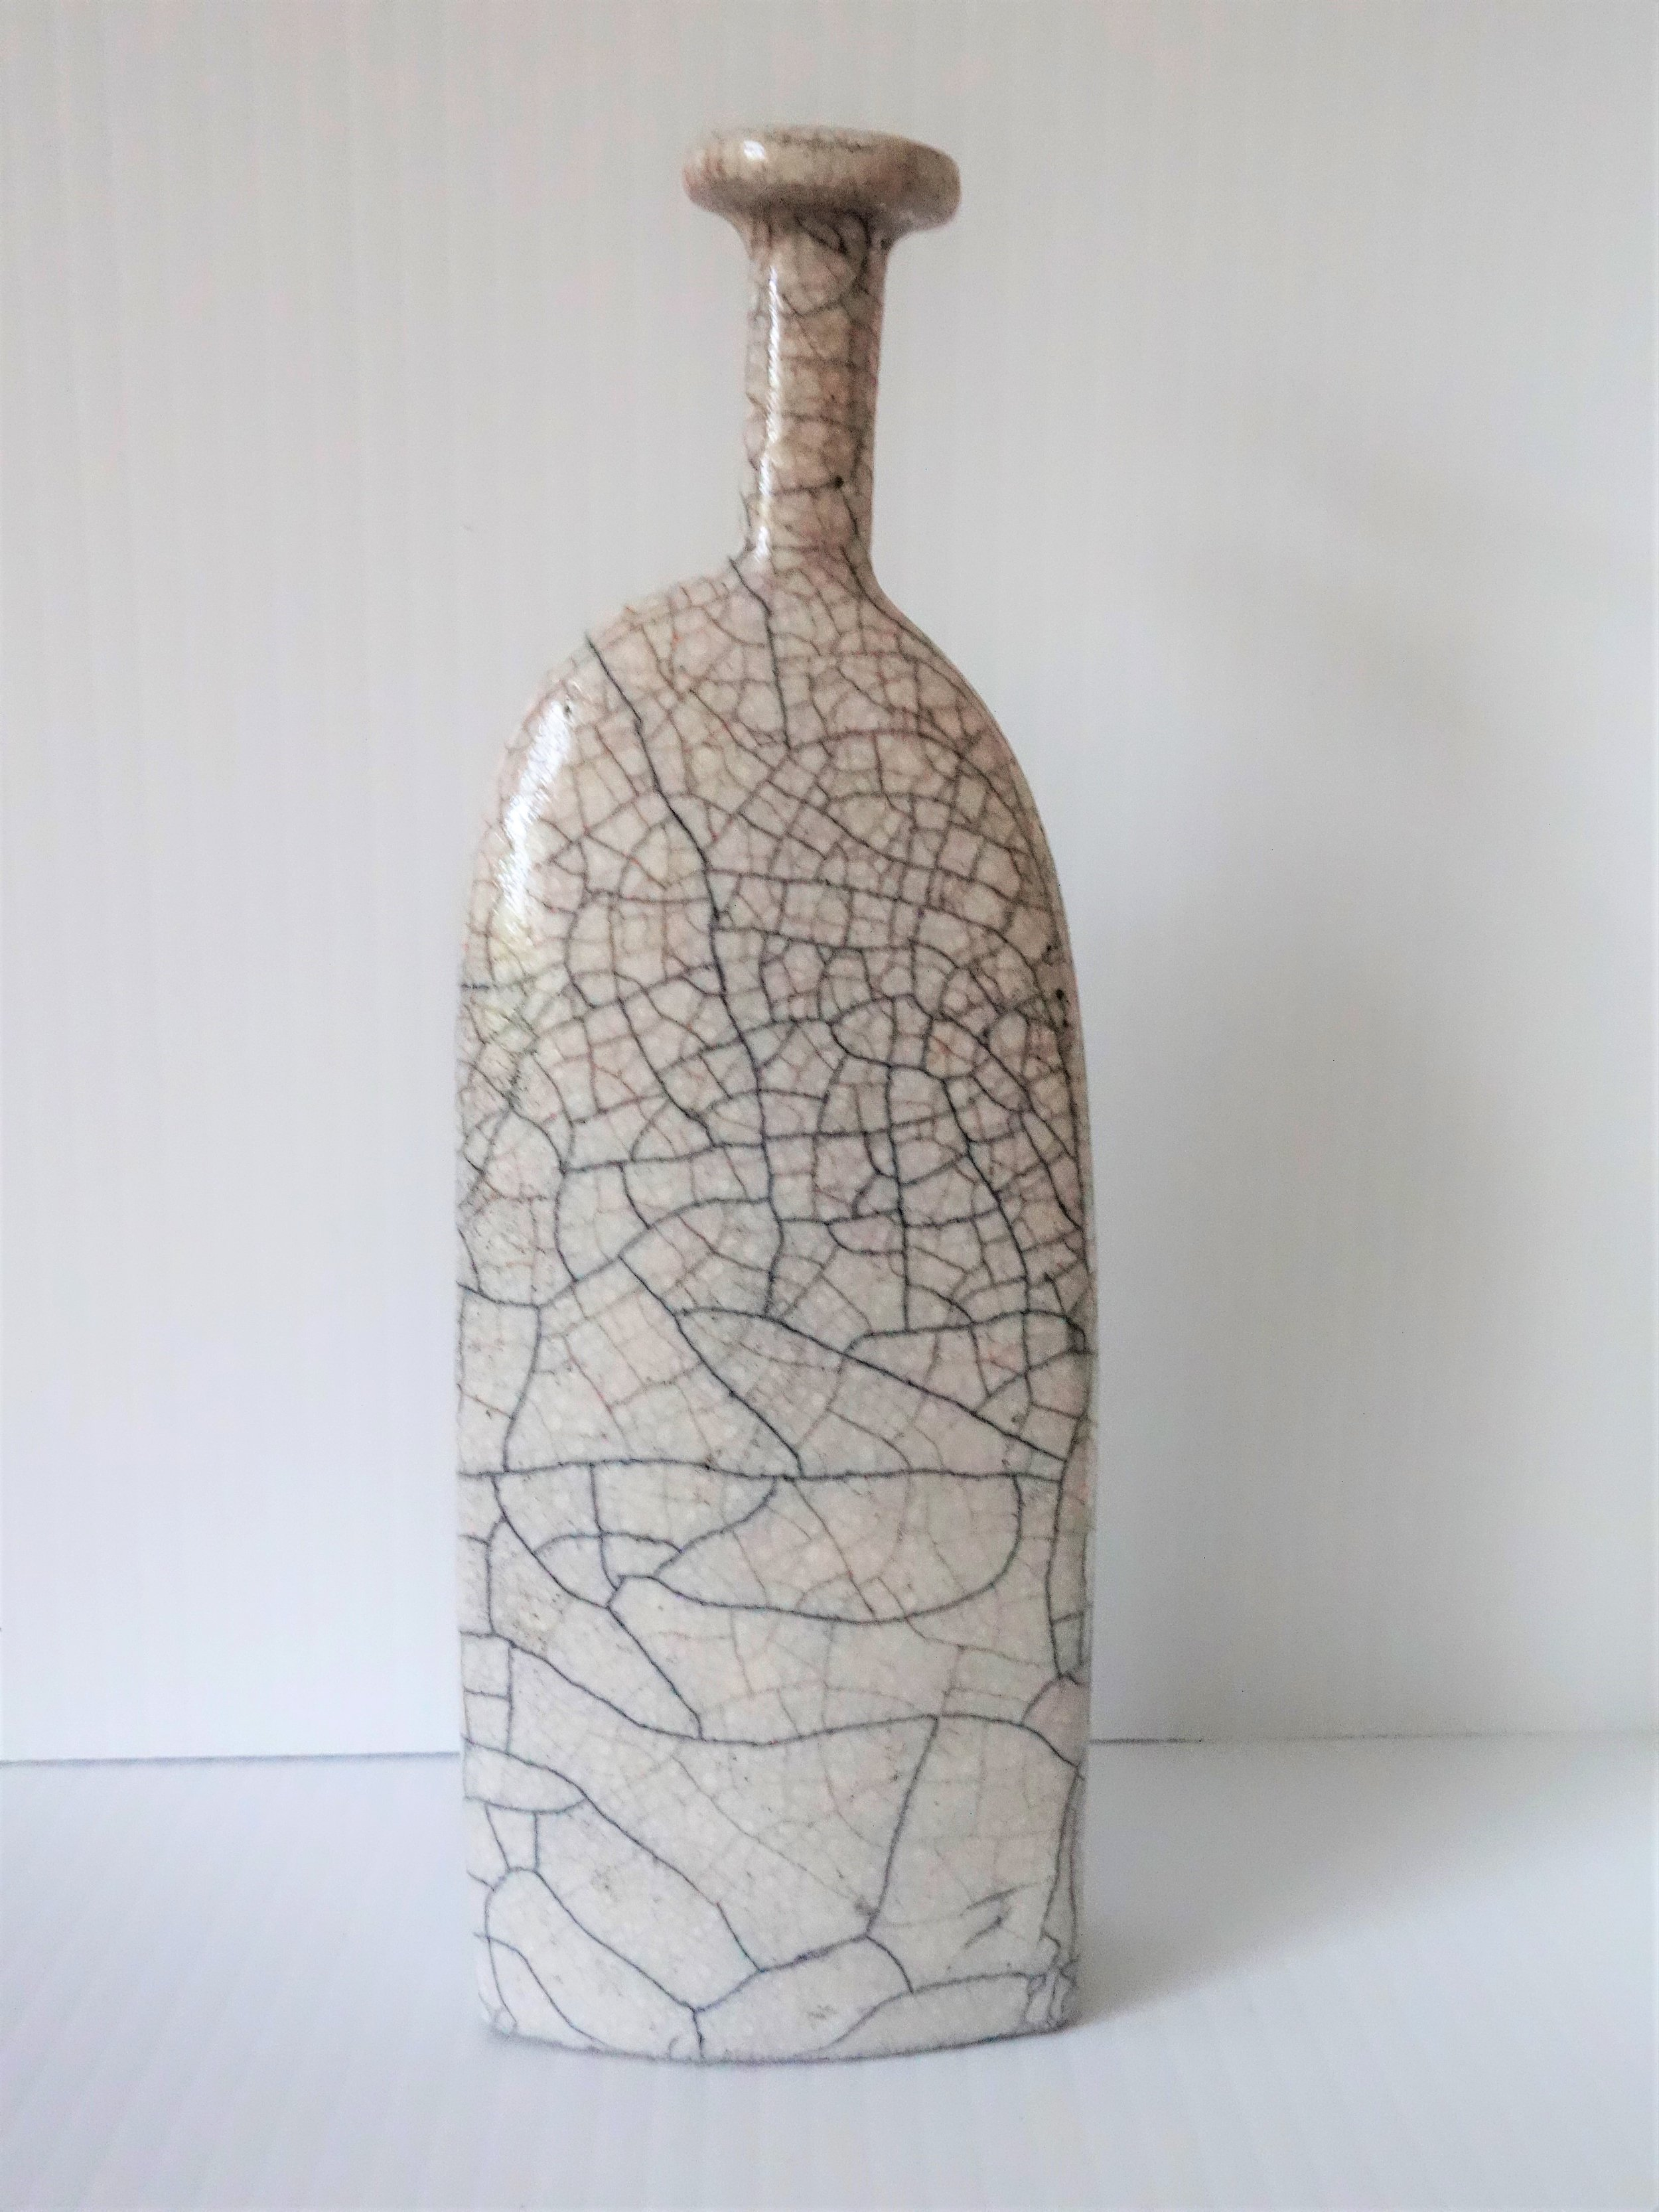 Title: White Raku Bottle (round top) Size: 18 cm (h) x 6 cm (w) Medium: Raku Price: £110